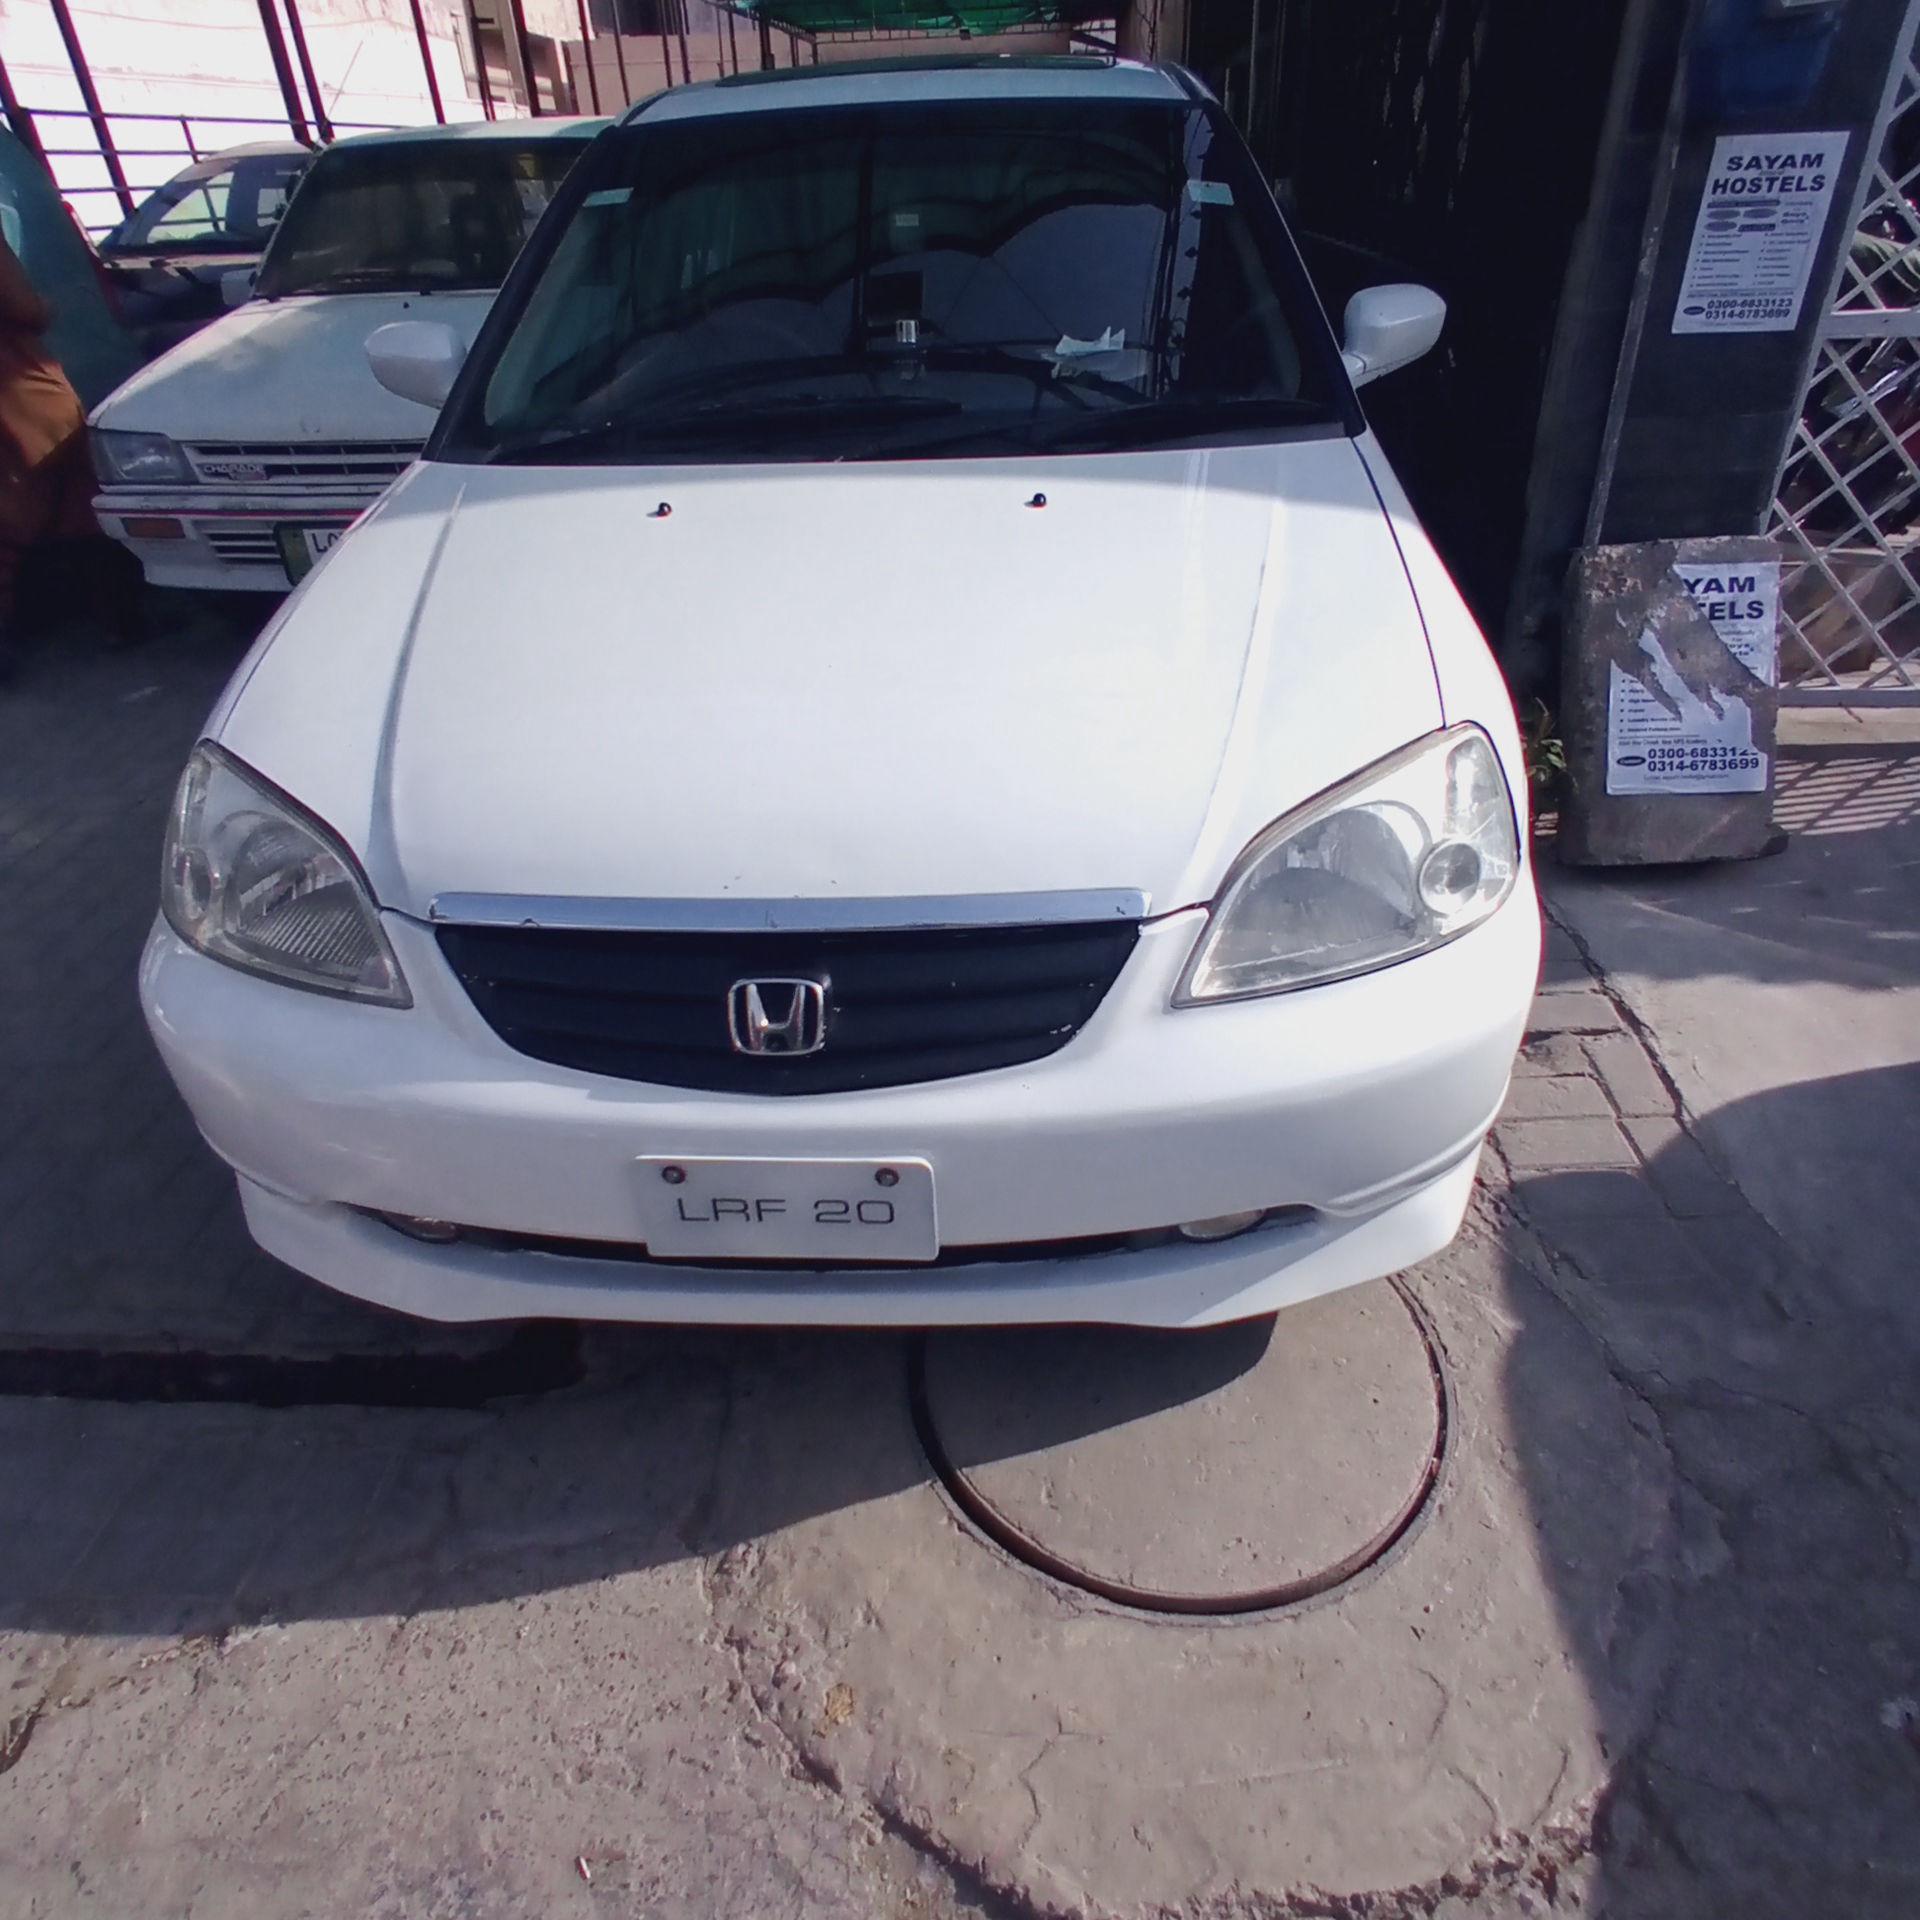 Honda Civic VTi Automatic 1.6 2002